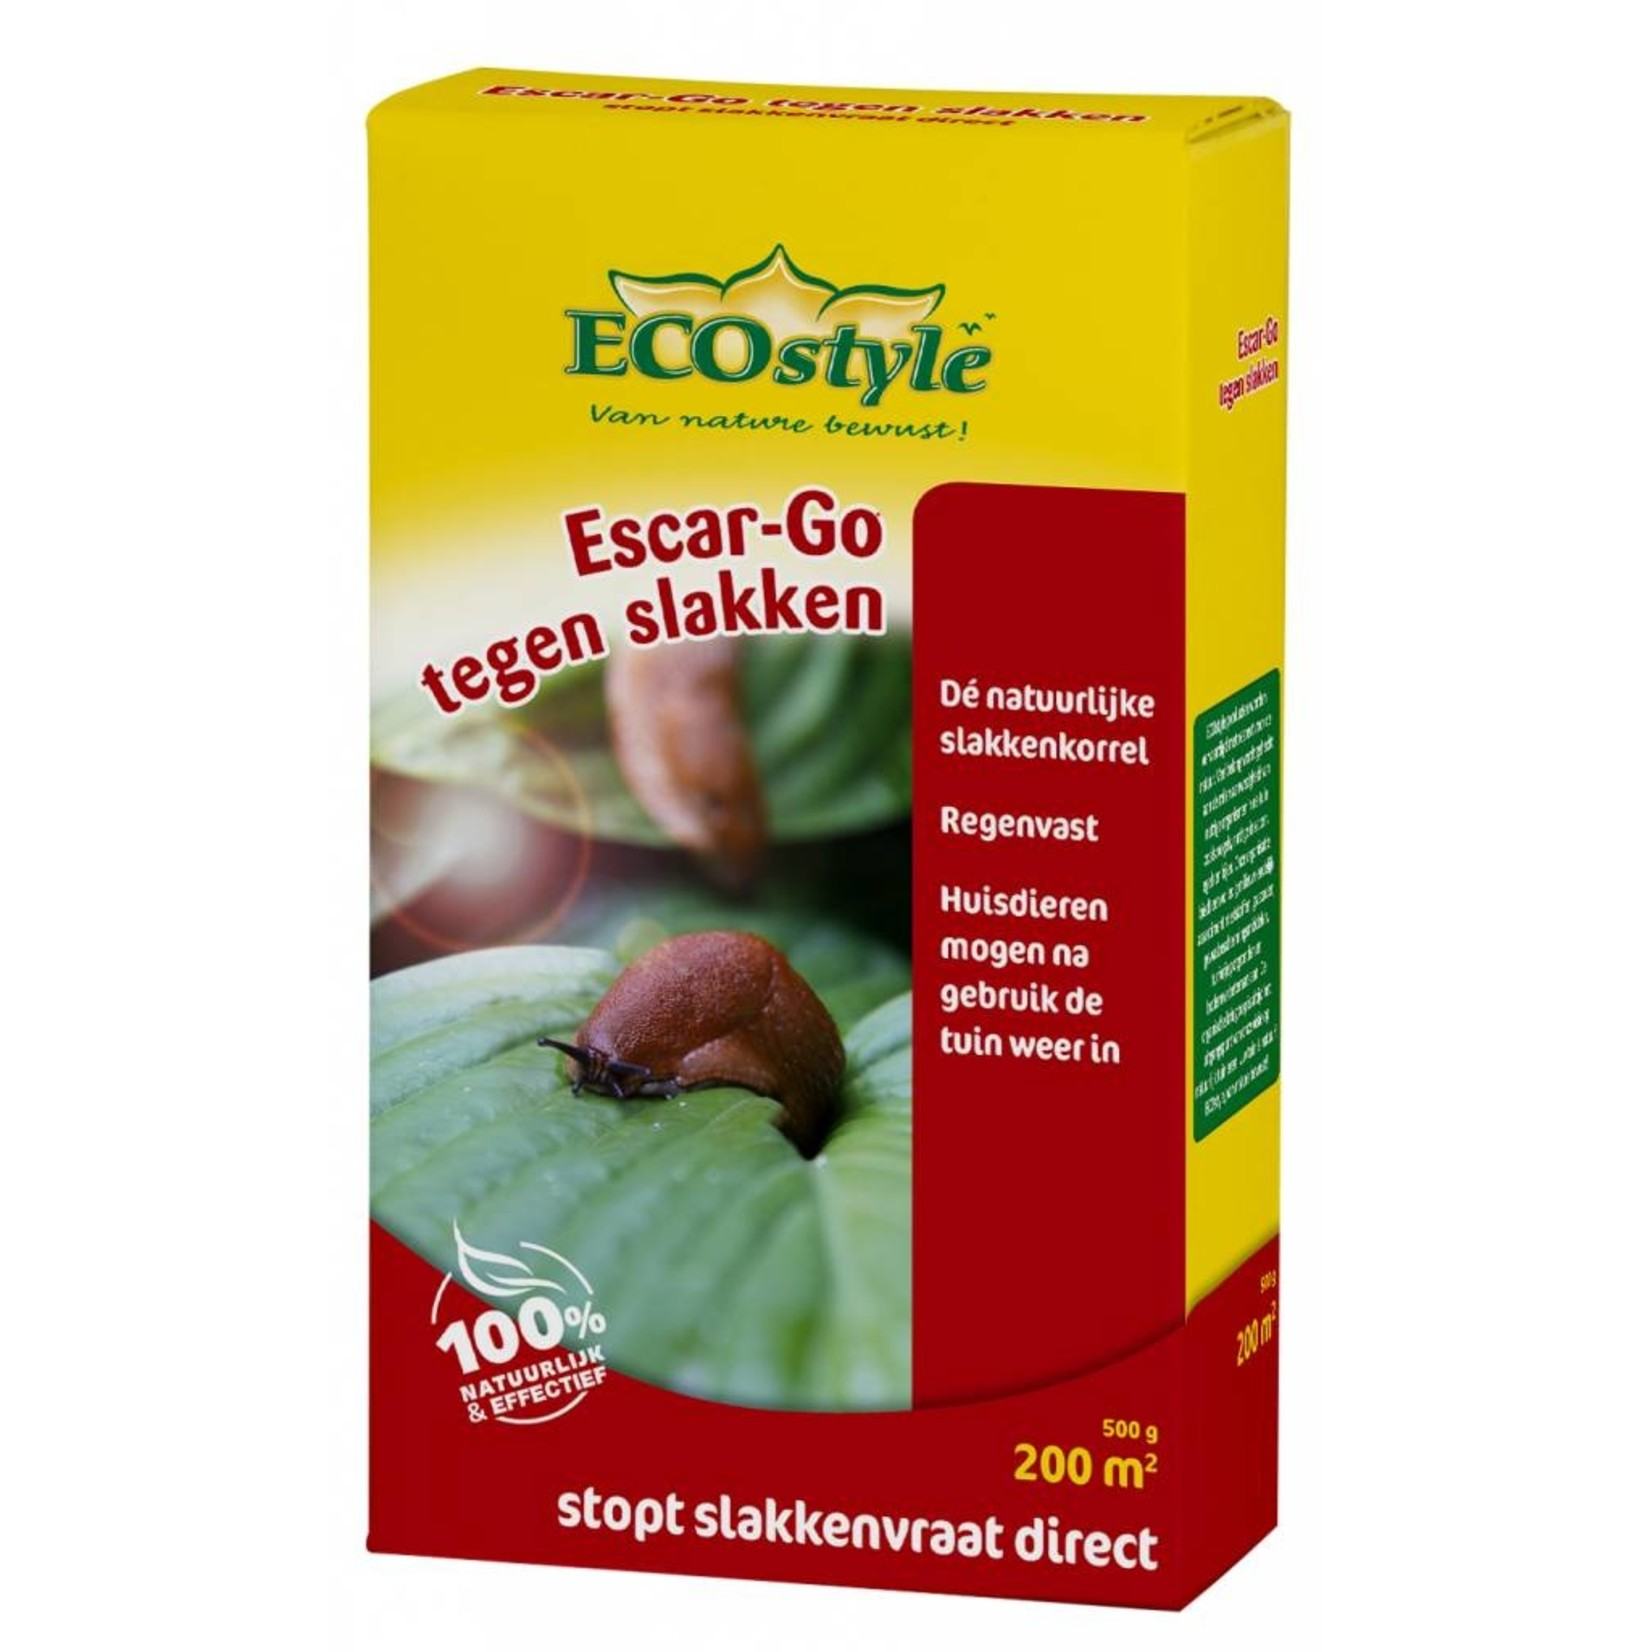 Ecostyle Escar-Go 500 gram tegen slakken (200 m2)